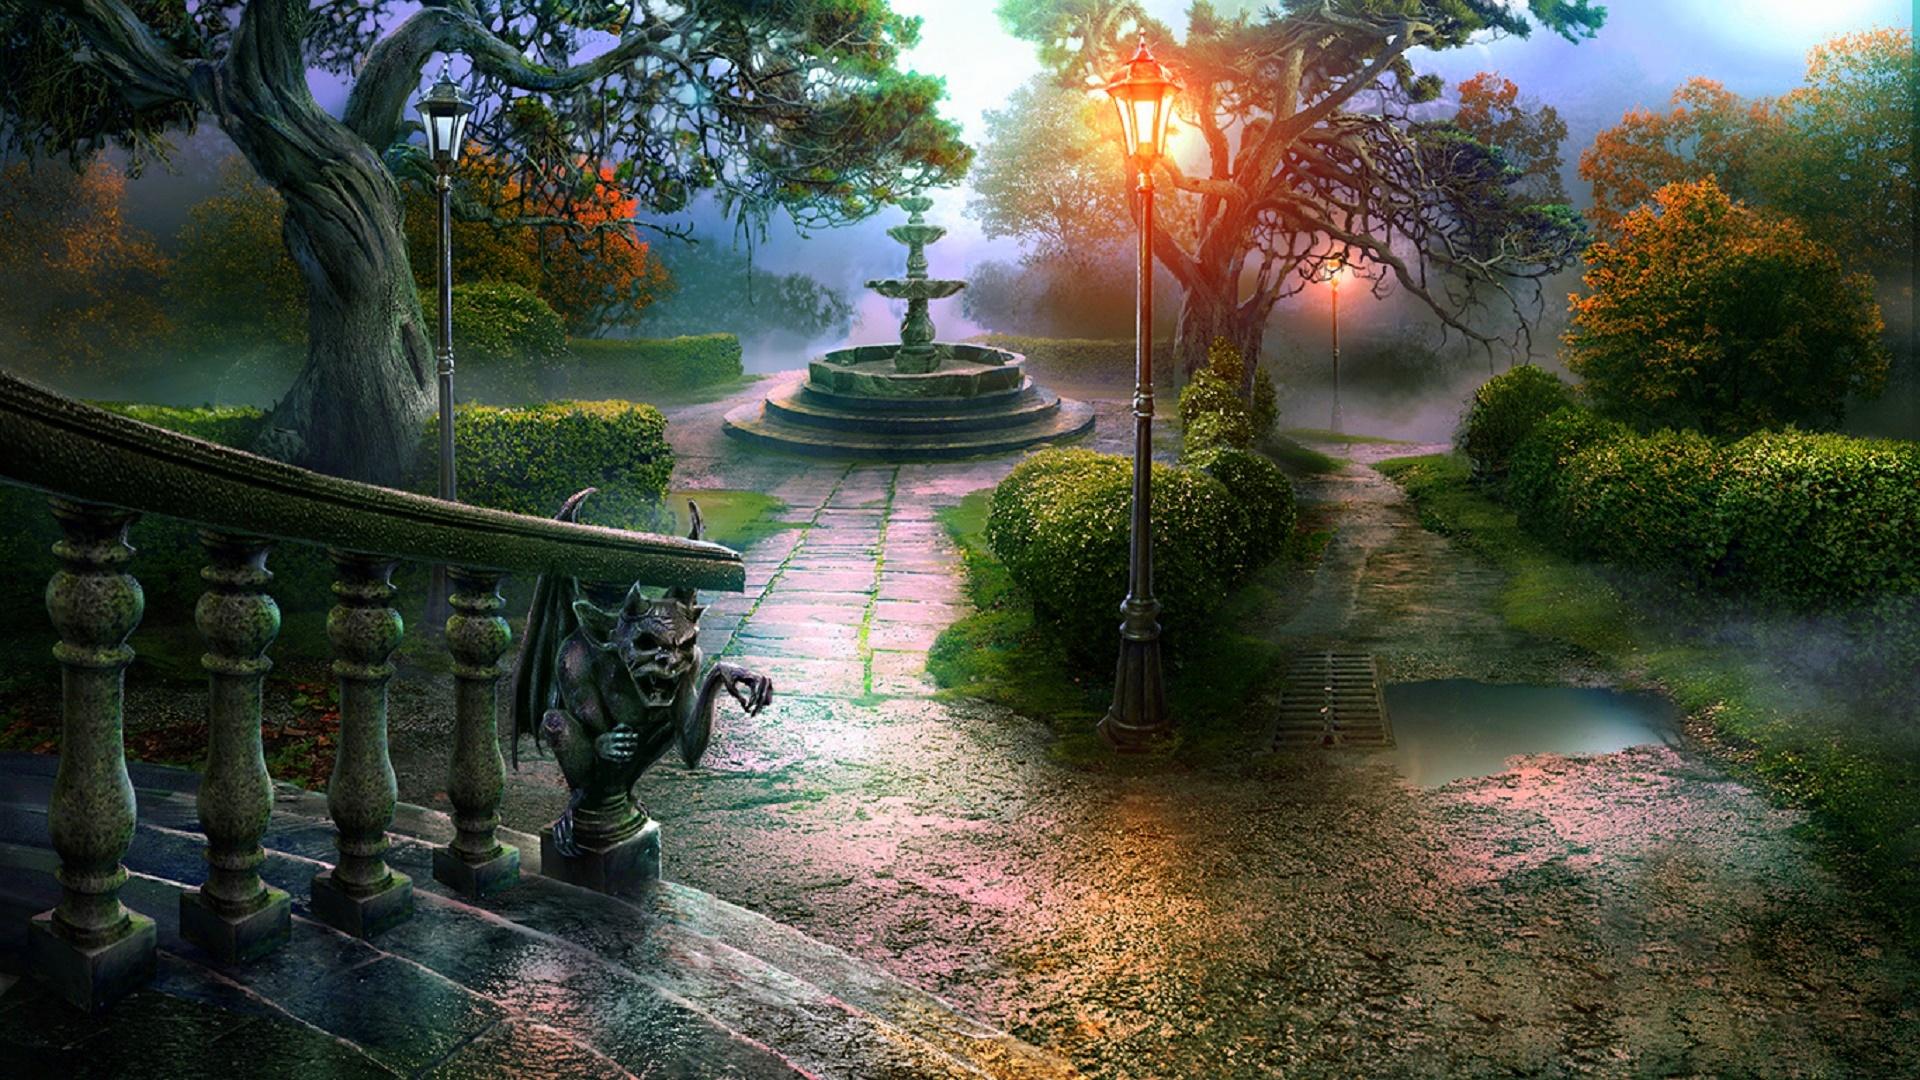 Autumn Fantasy Landscape HD Wallpaper | Background Image ...